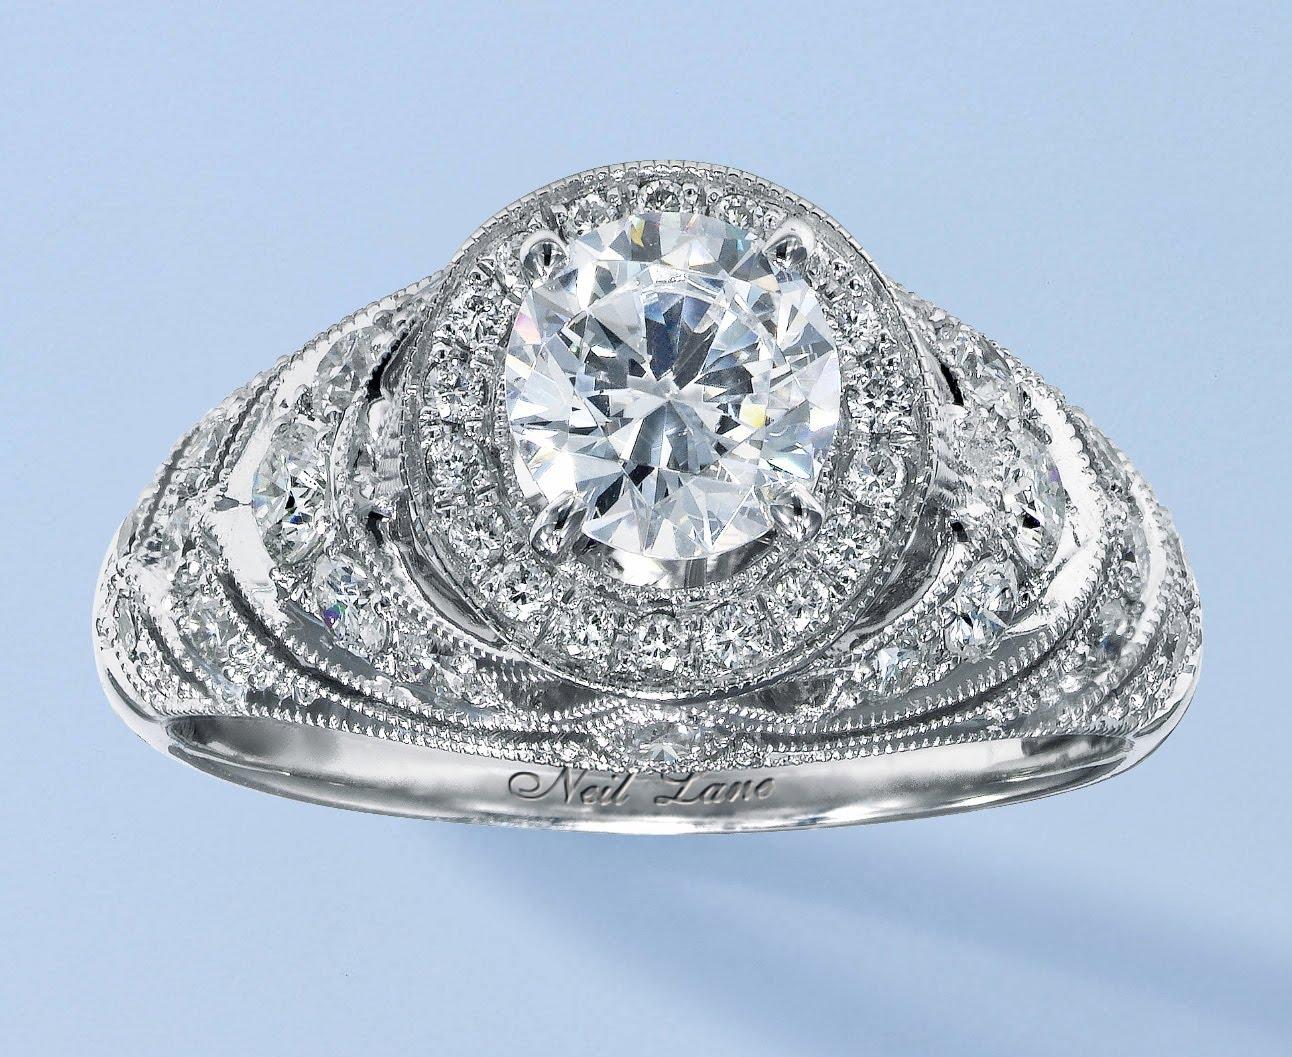 neil lane creates bridal collection for kay jewelers wedding bands Neil Lane Creates Bridal Collection for Kay Jewelers